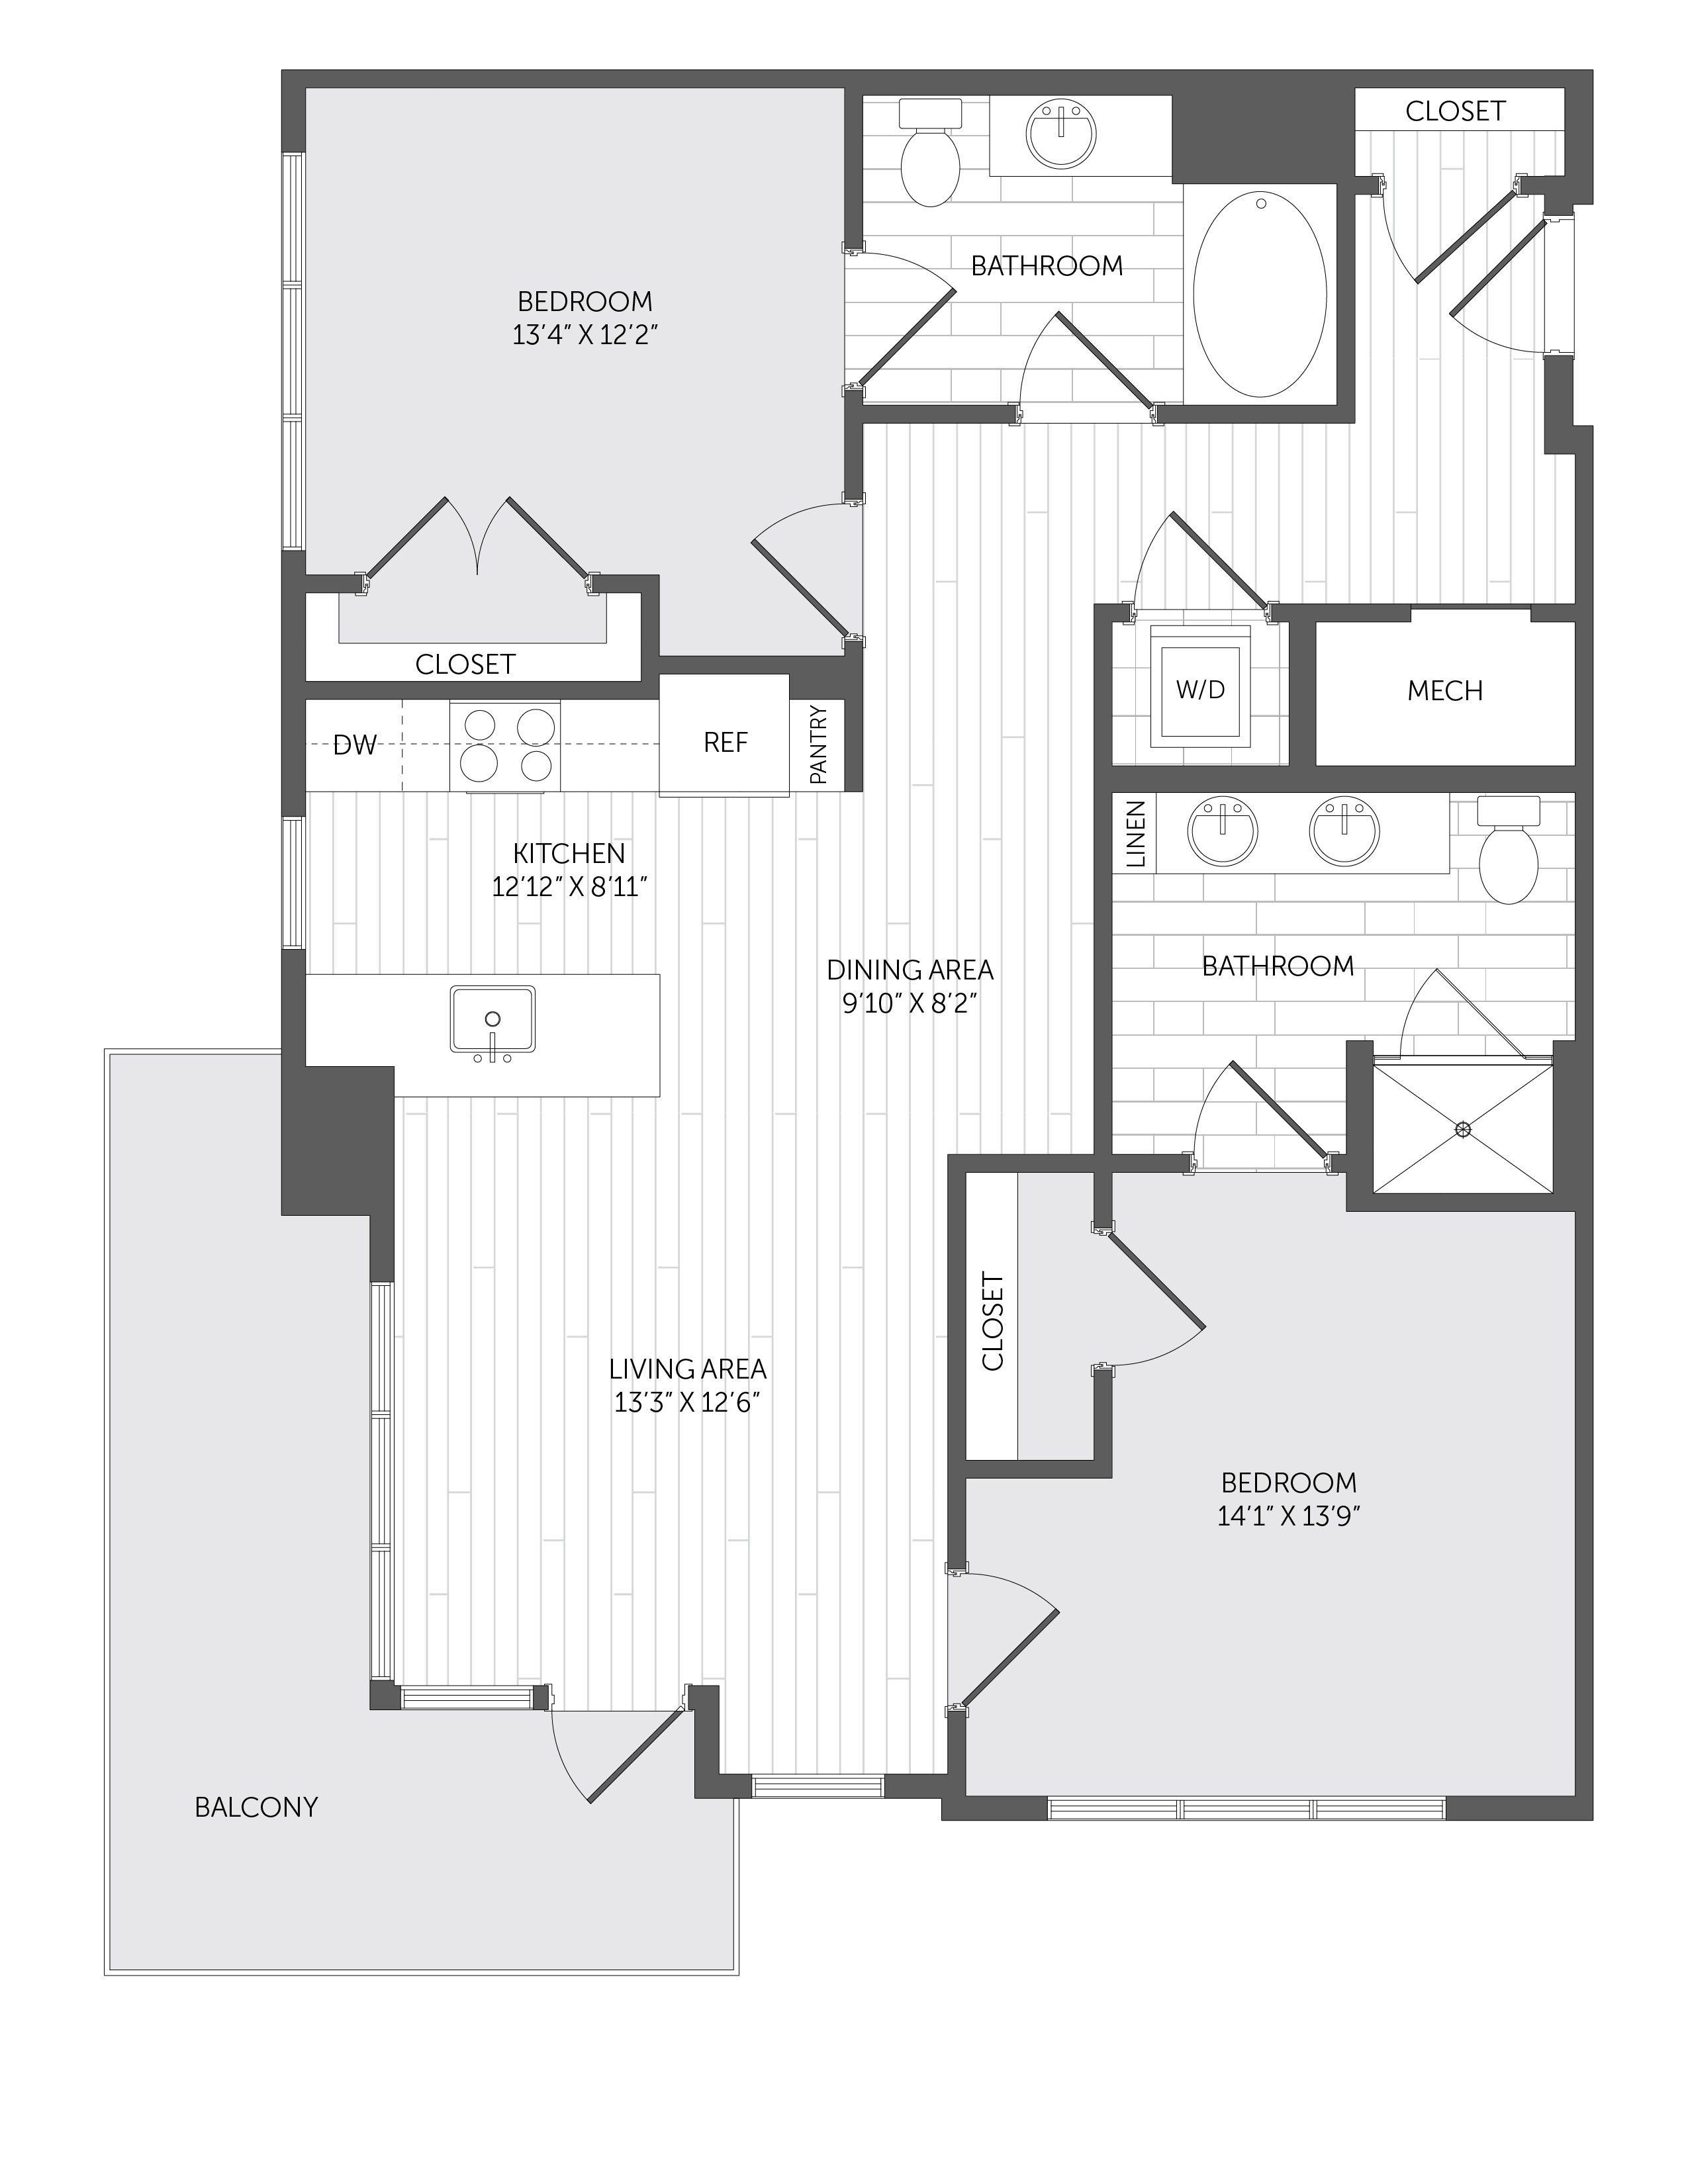 b5 meriel marina bay two bedroom two bathroom layout 1100 square rh pinterest com